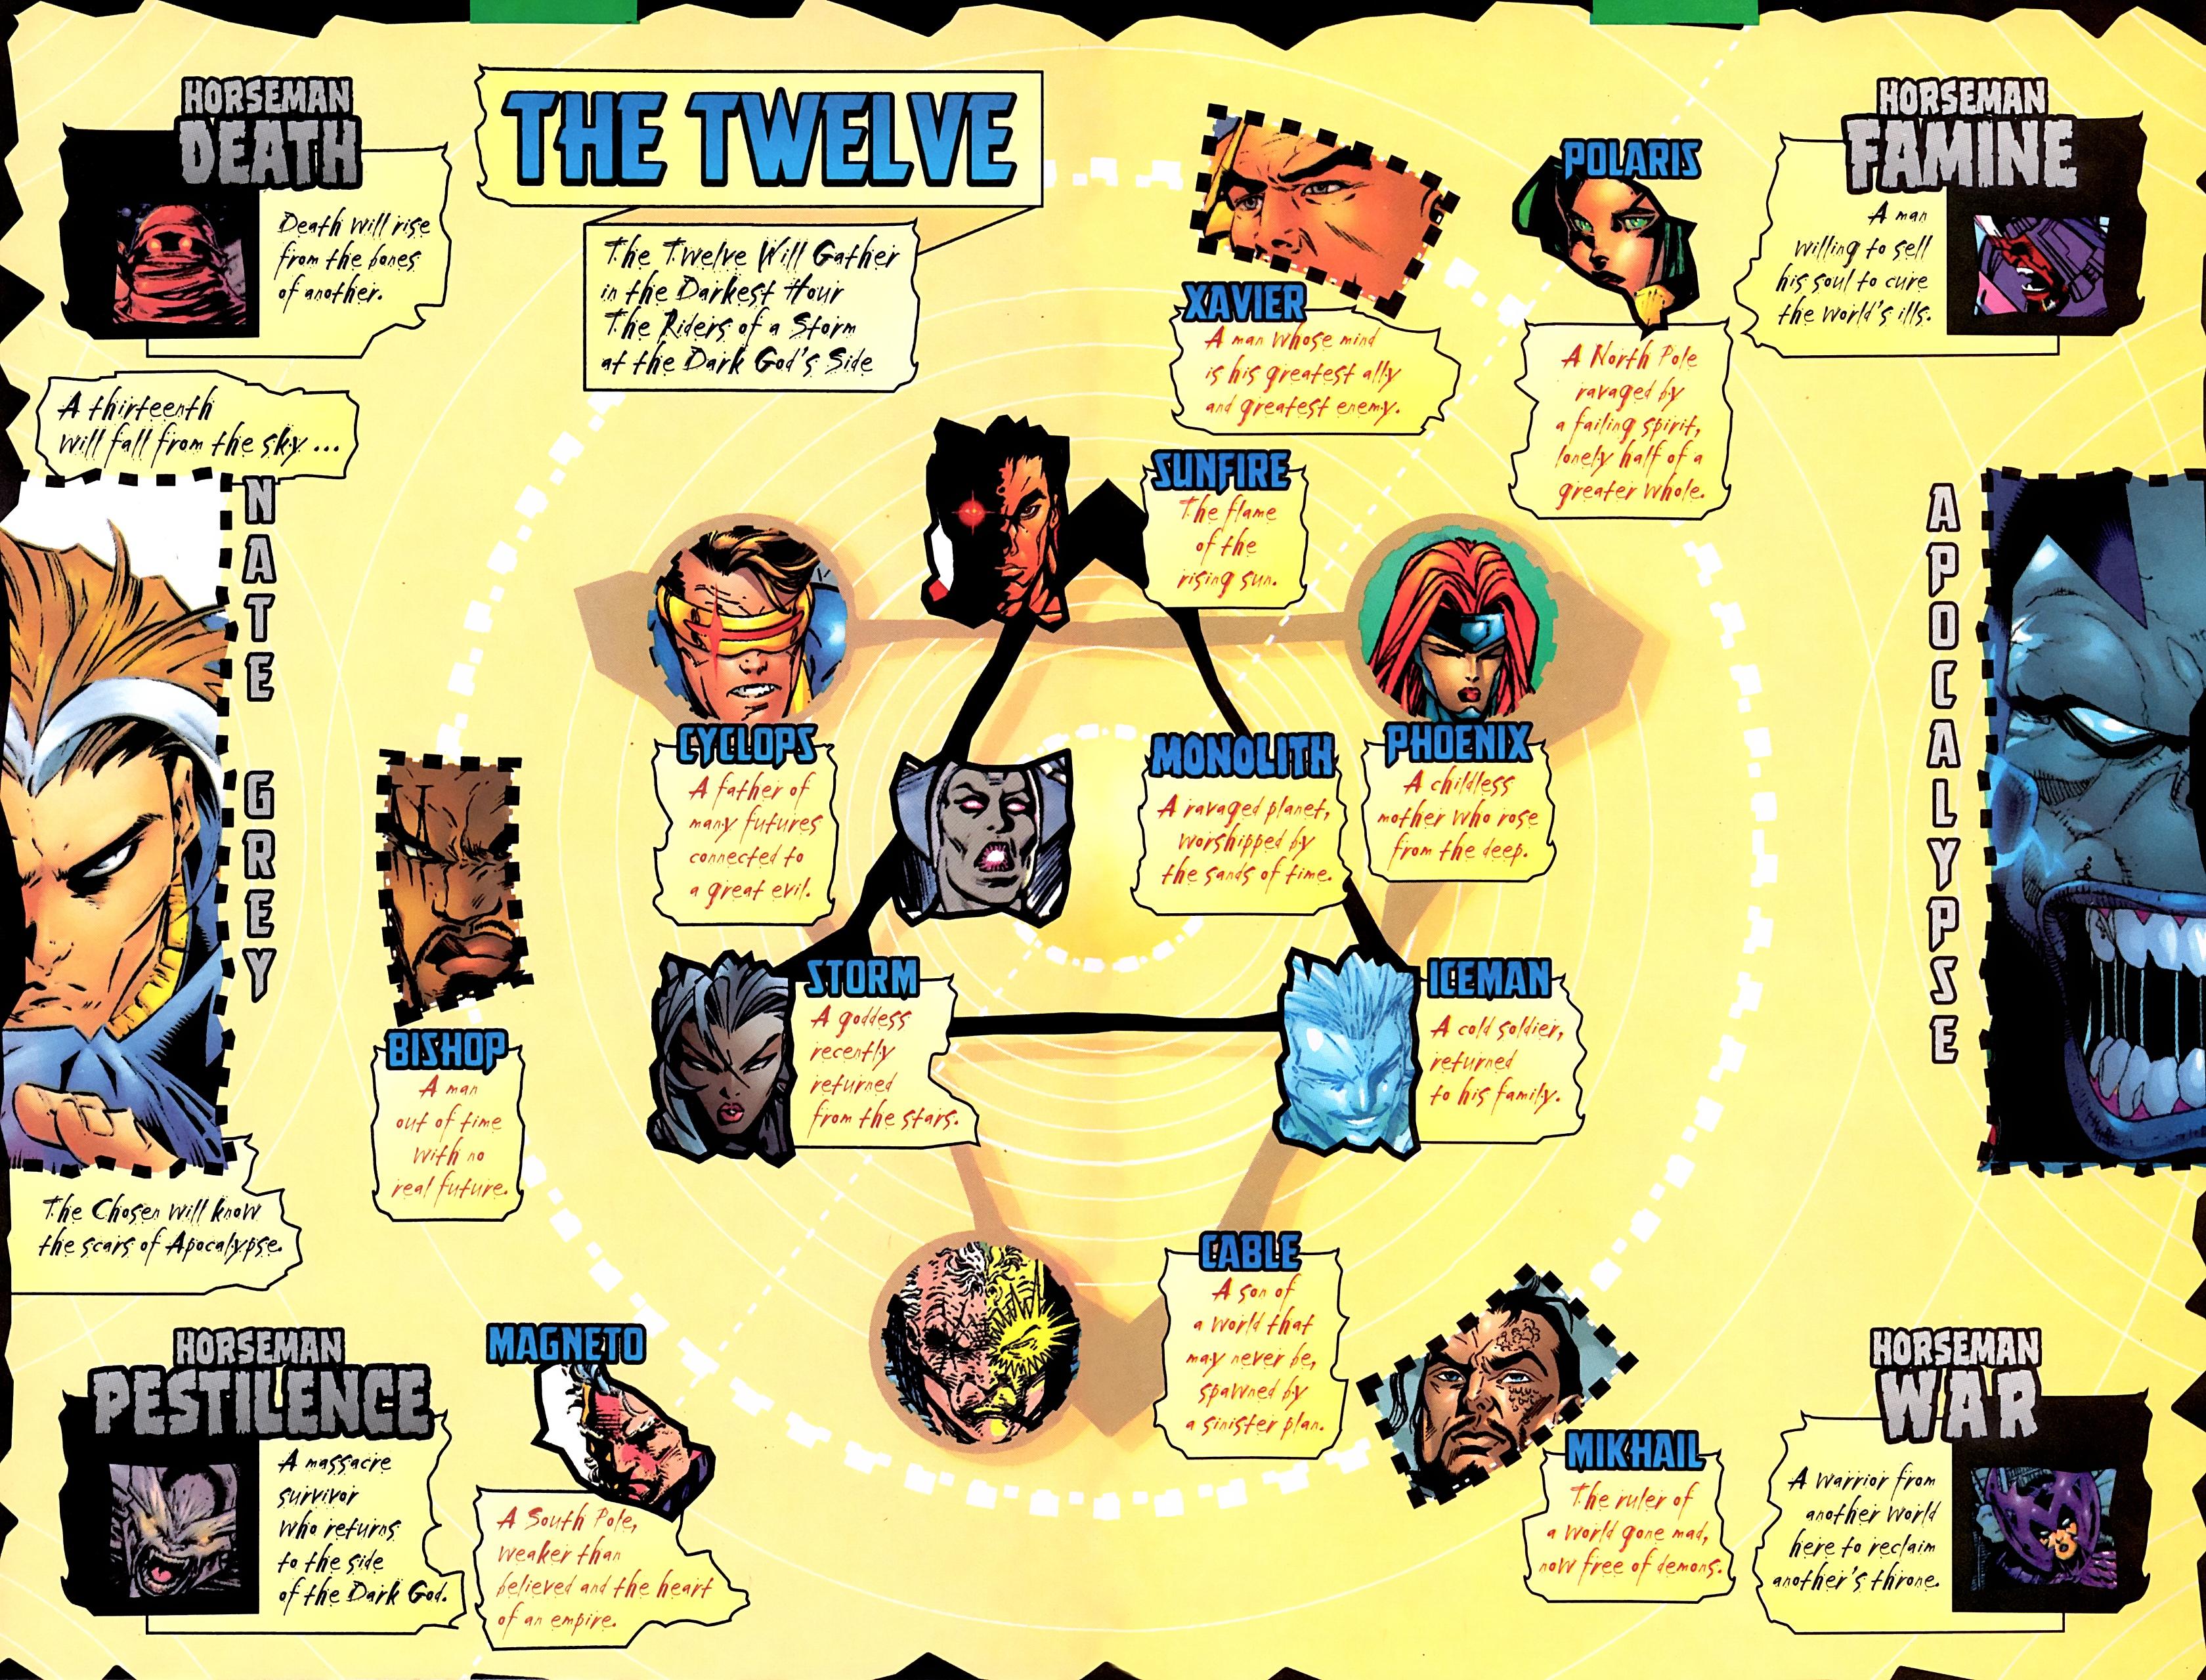 Twelve (Mutants) (Earth-616)/Gallery